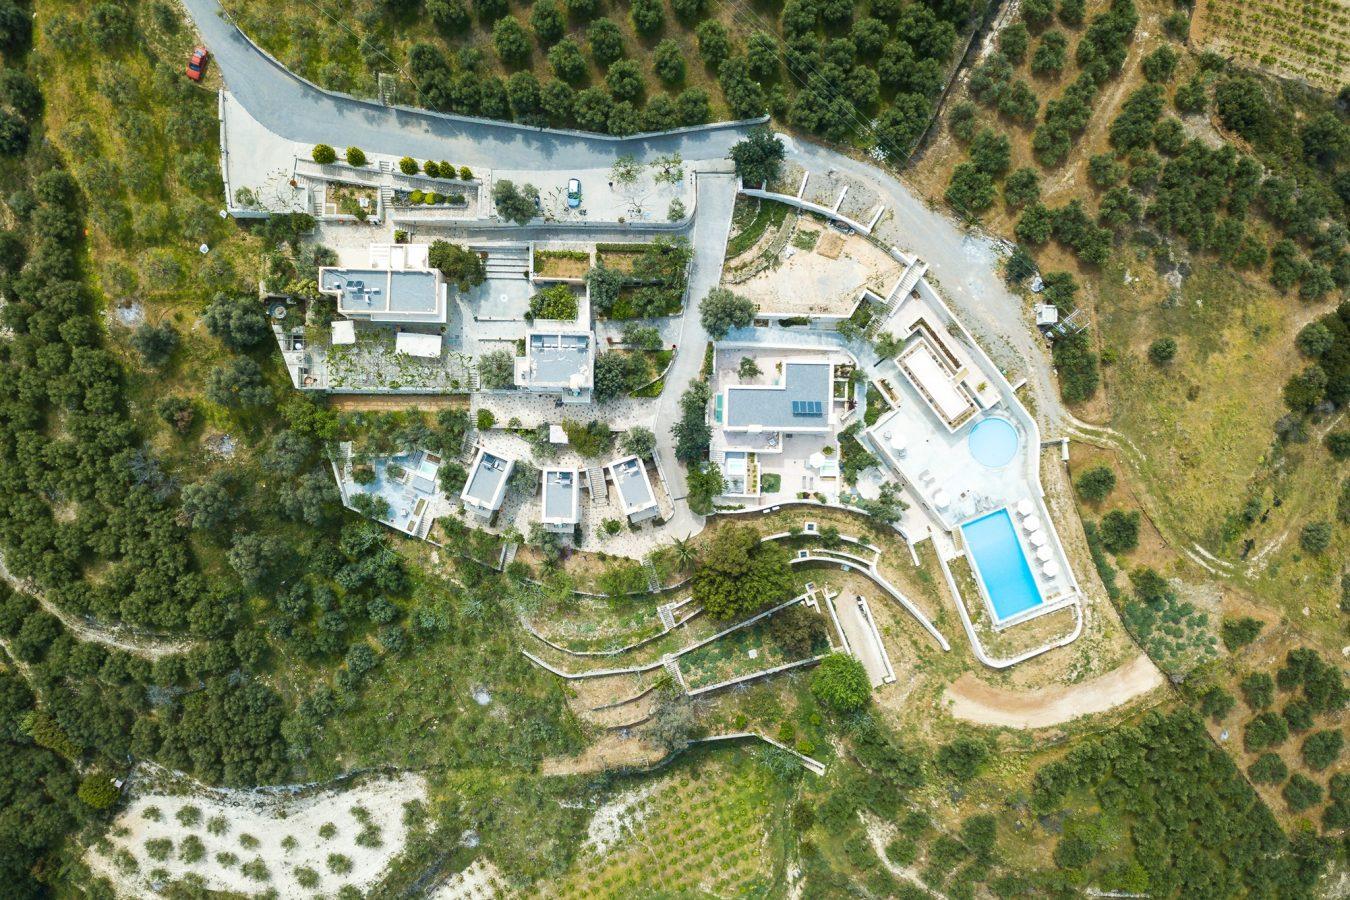 Dalabelos agrotourism resort